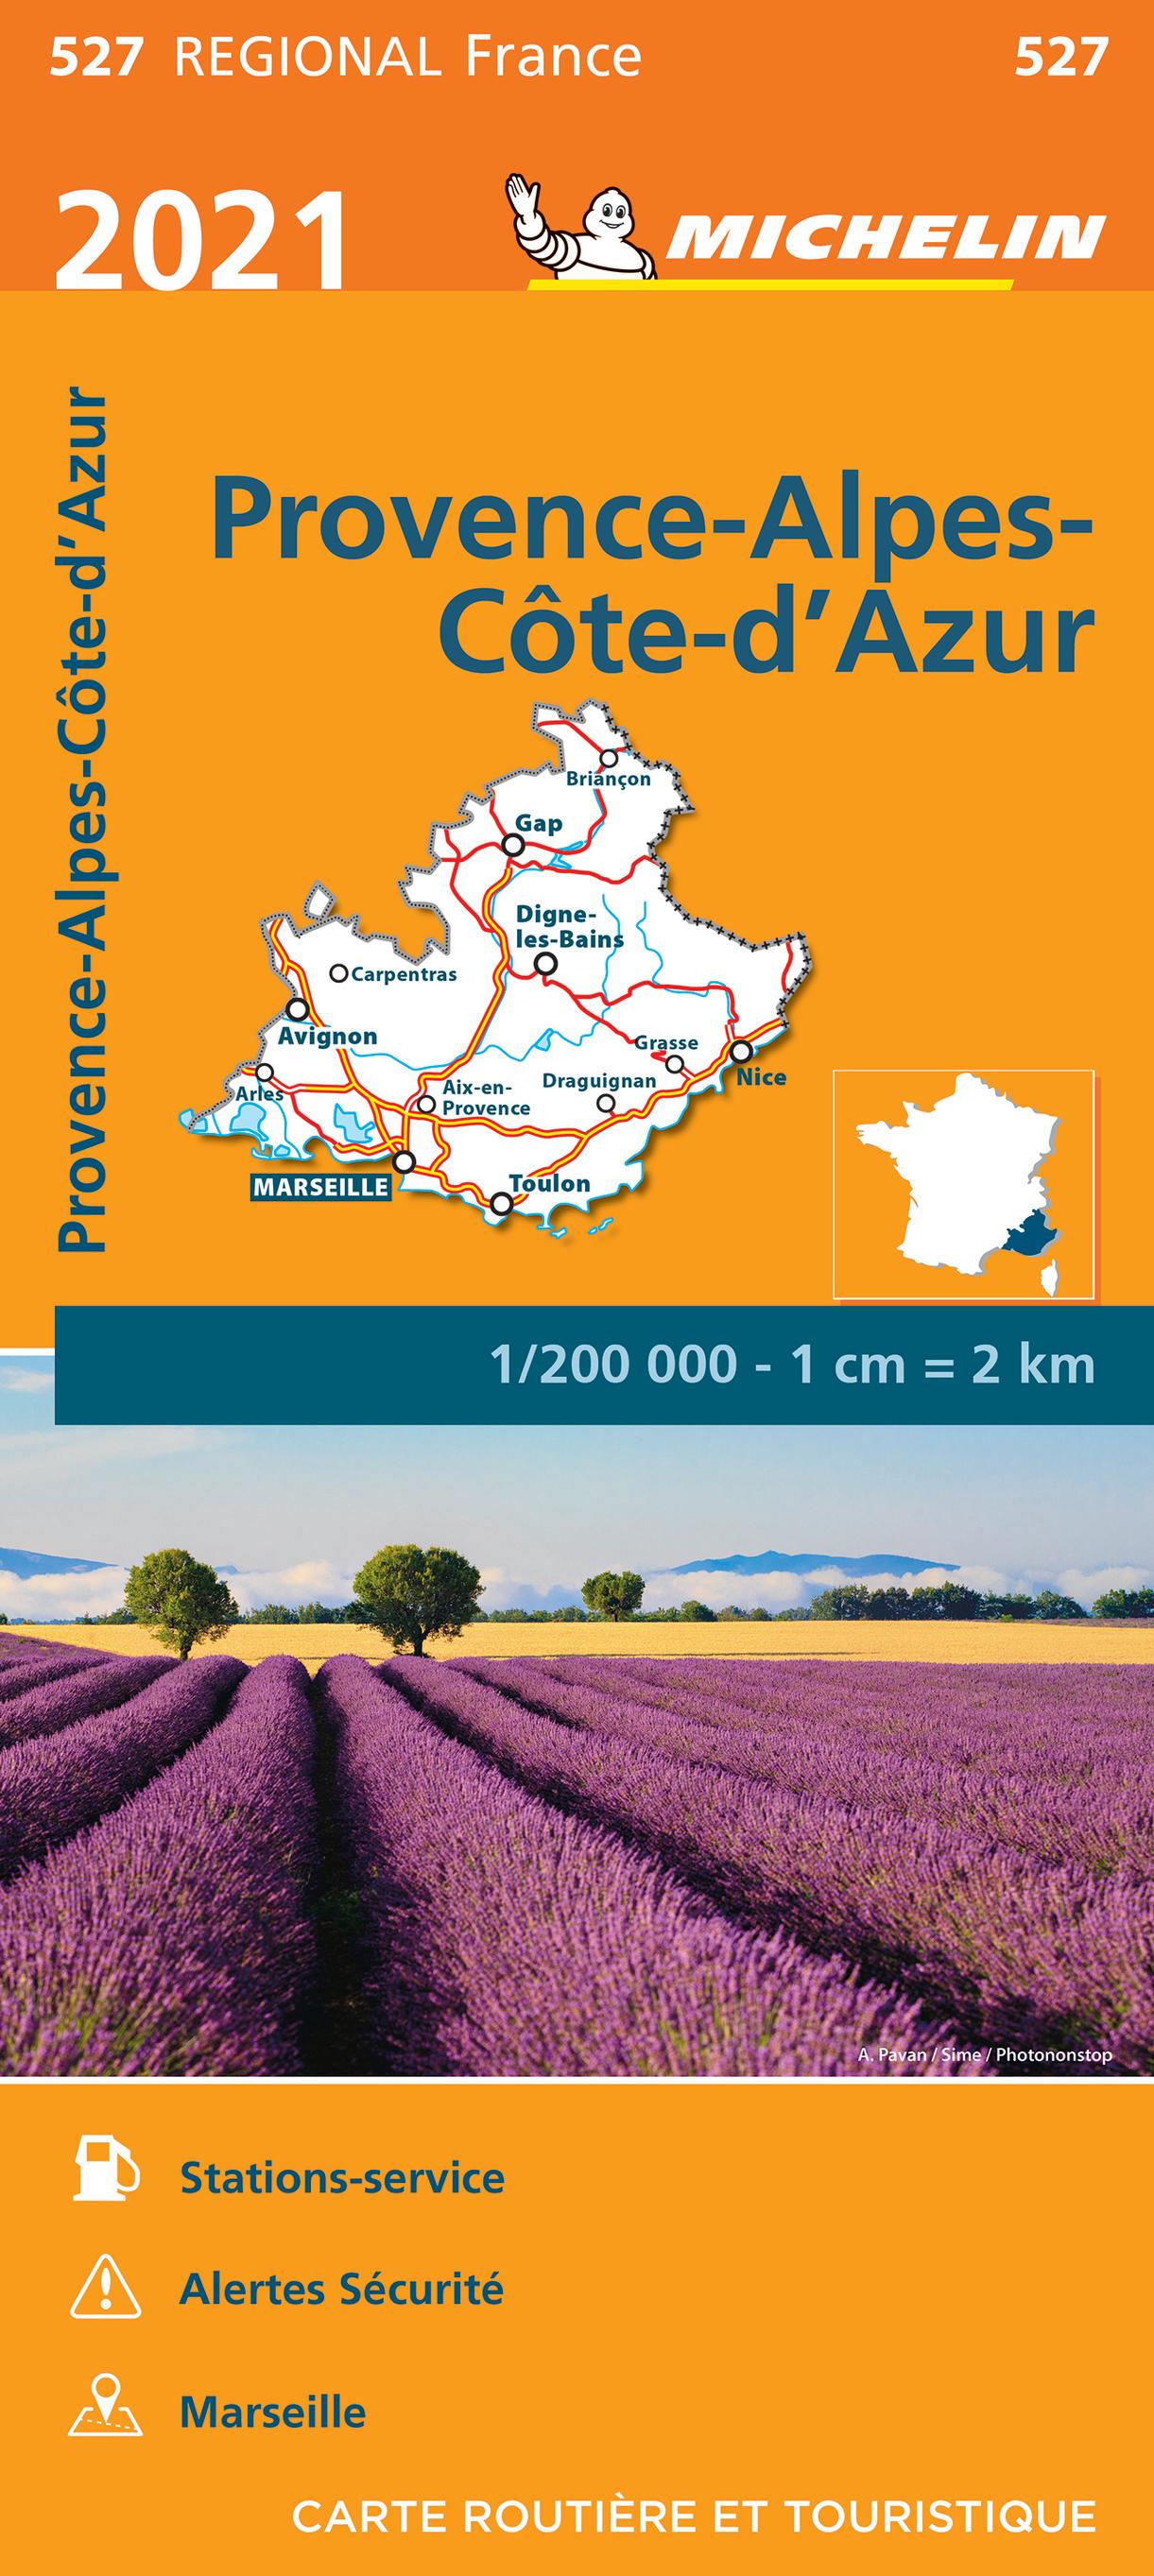 527 Provence-Alpes-Côte-d Azur  | Michelin  wegenkaart, autokaart 1:200.000 9782067249806  Michelin Regionale kaarten  Landkaarten en wegenkaarten Côte d'Azur, Provence, Marseille, Camargue